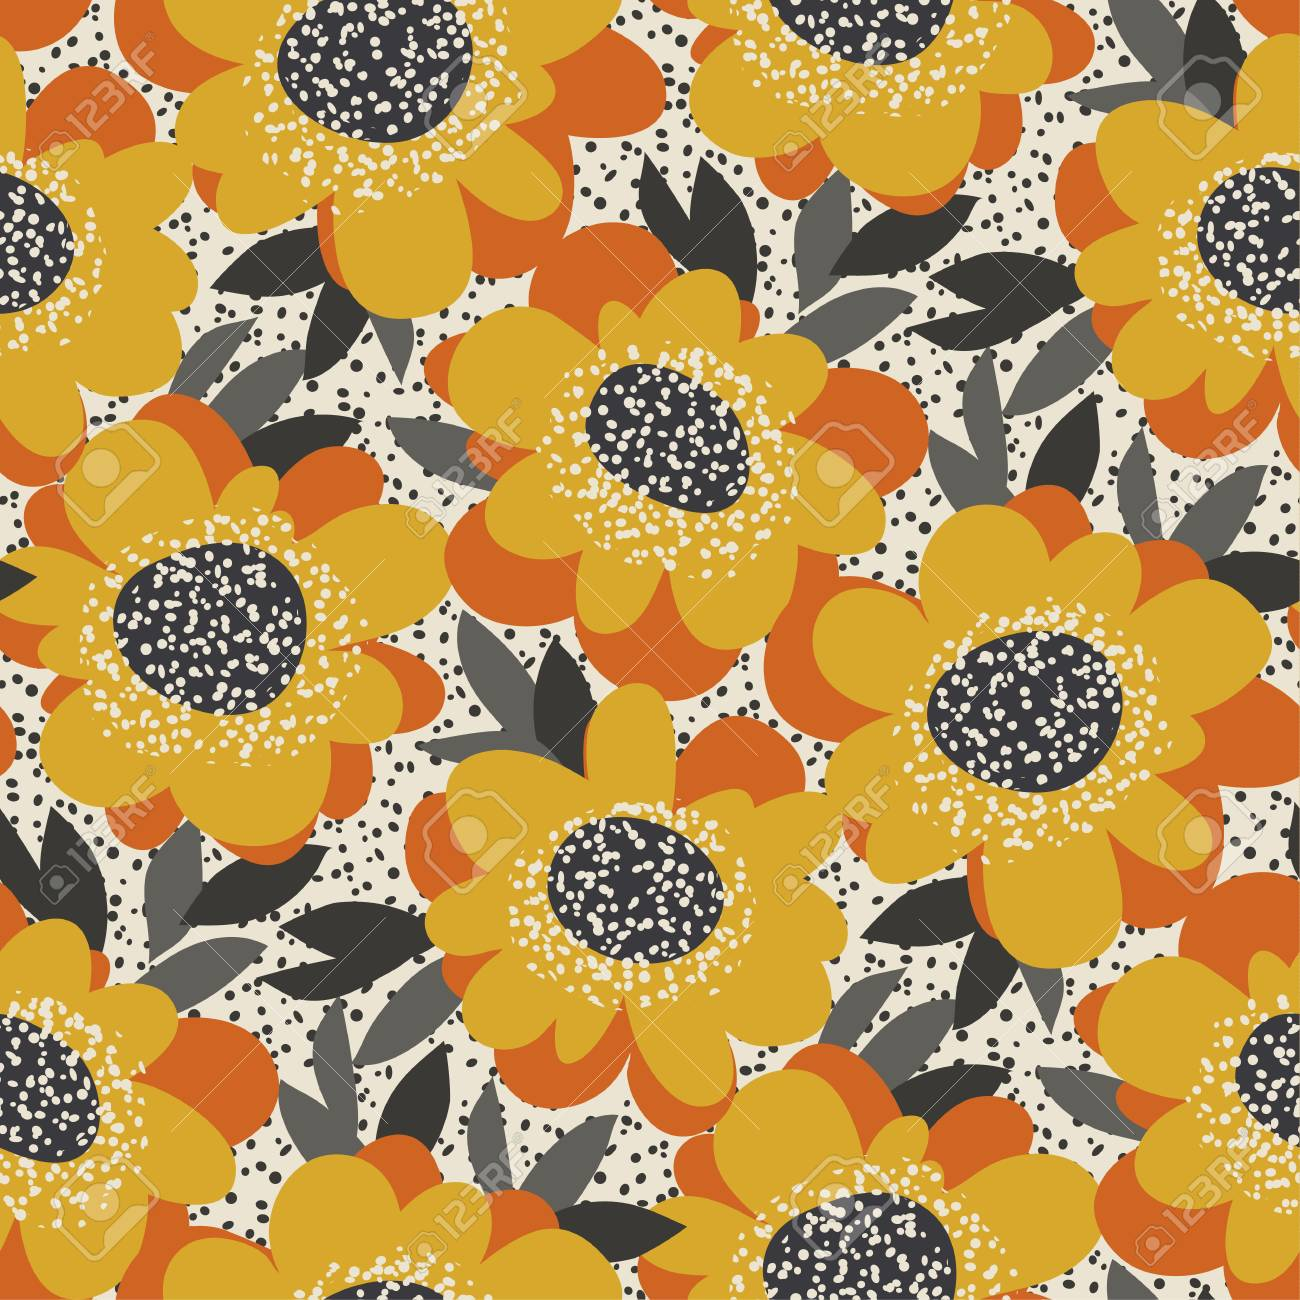 Simple Free Drawn Floral Seamless Pattern Retro 60s Flower Motif